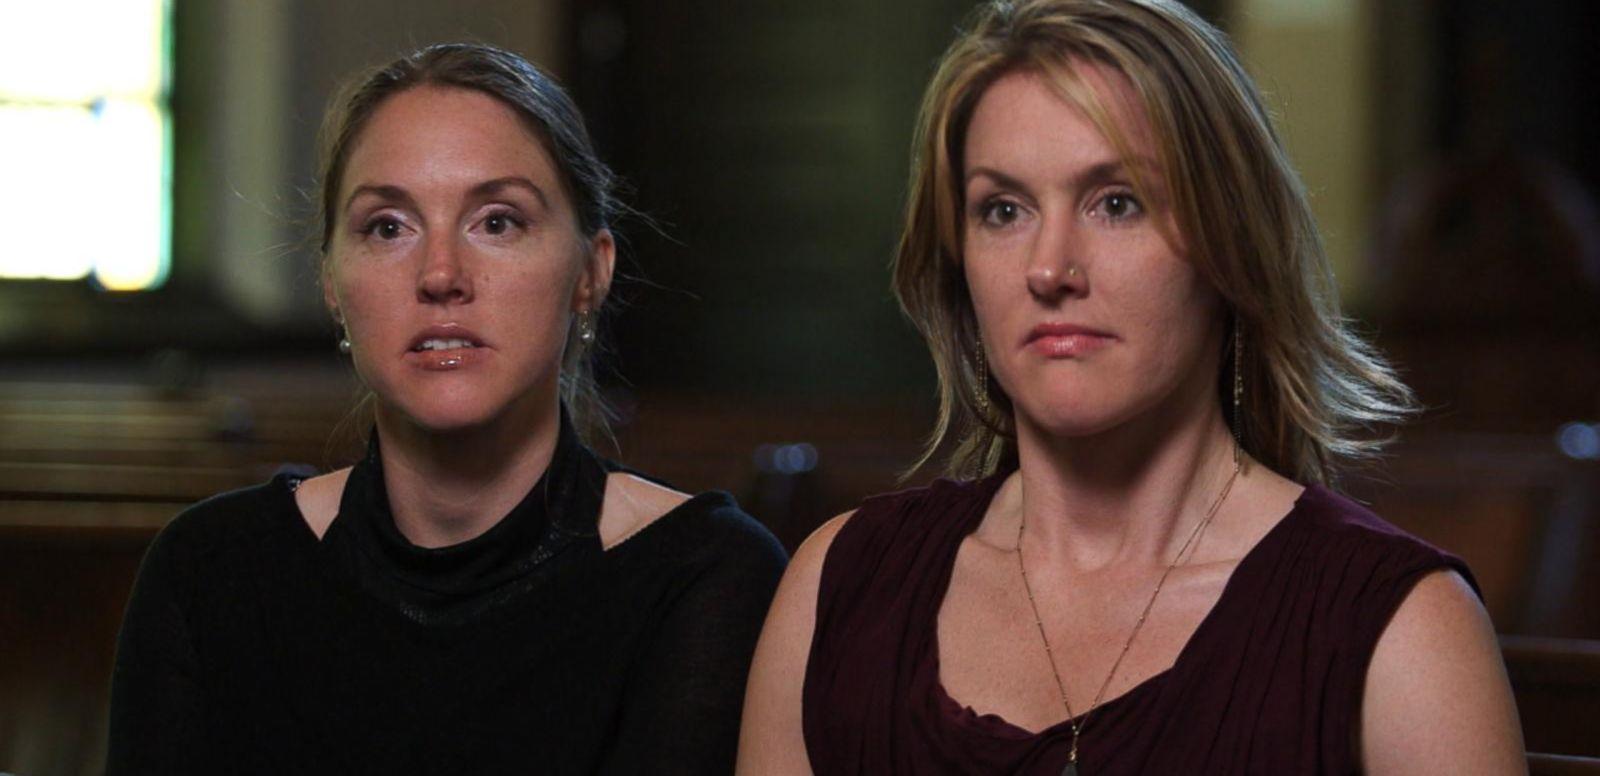 Twin Sisters, Ex-Children of God Members, Describe